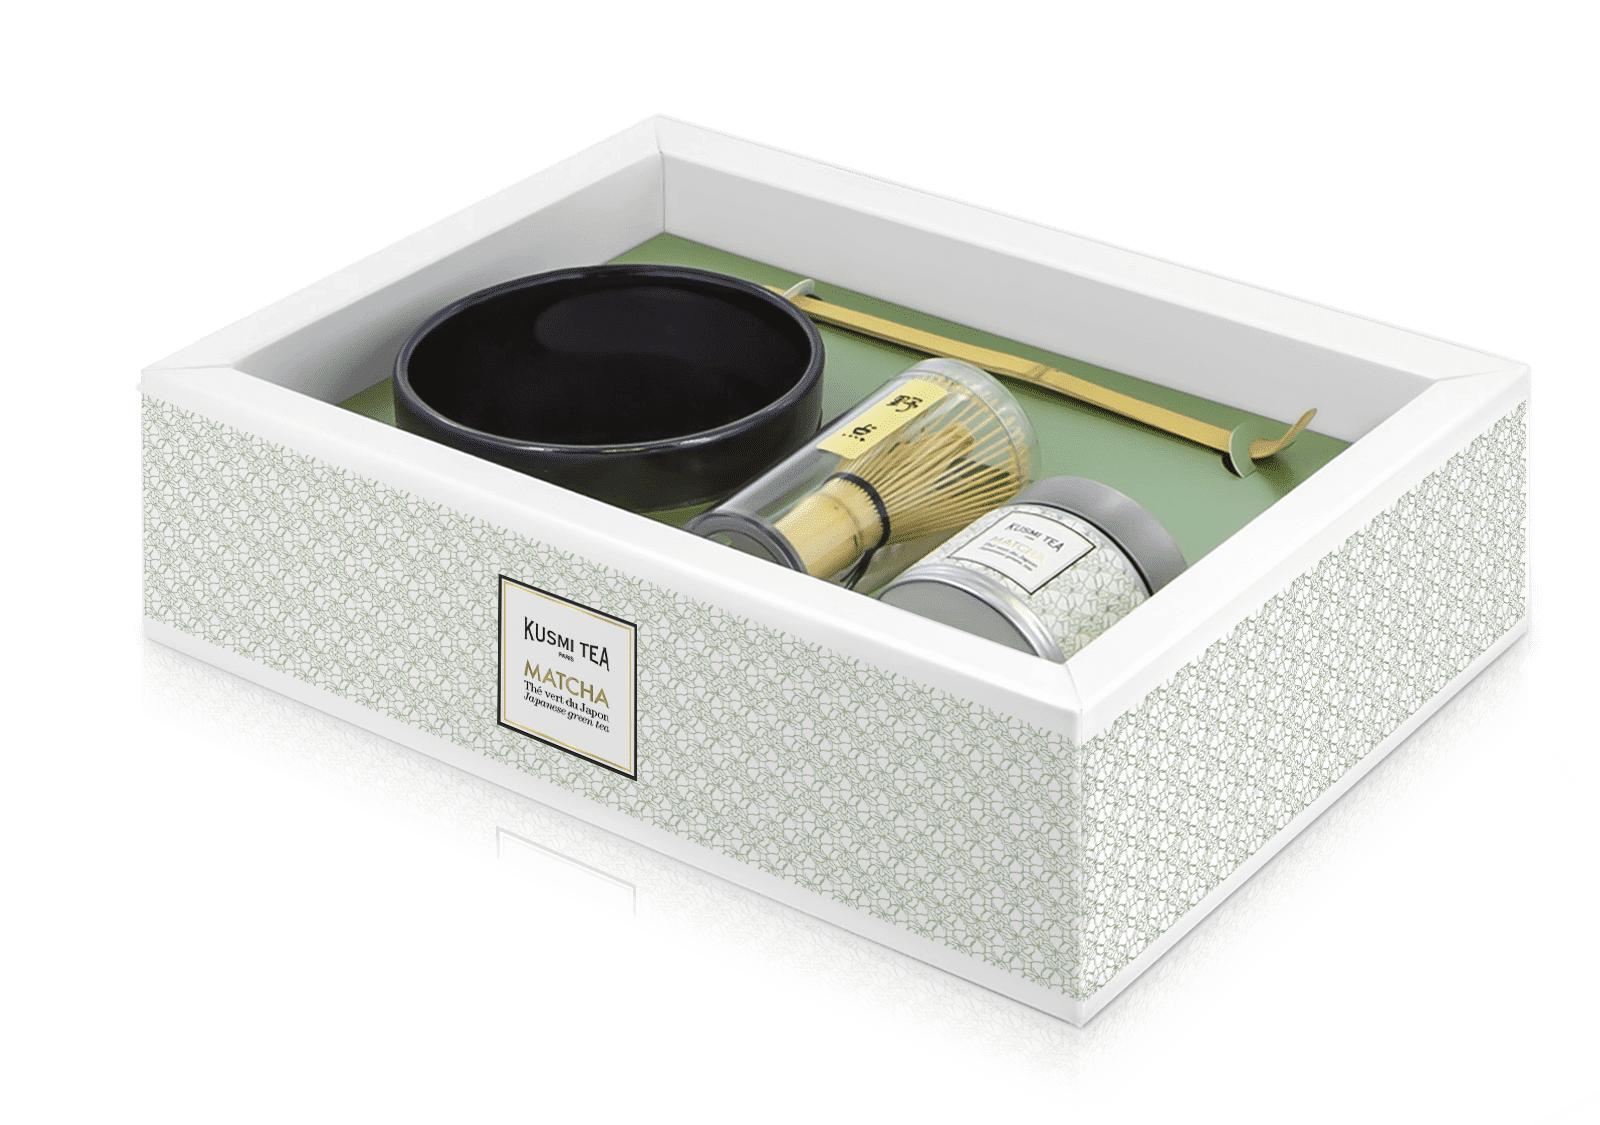 KUSMI TEA Coffret Matcha - Thé vert du Japon - Kusmi Tea